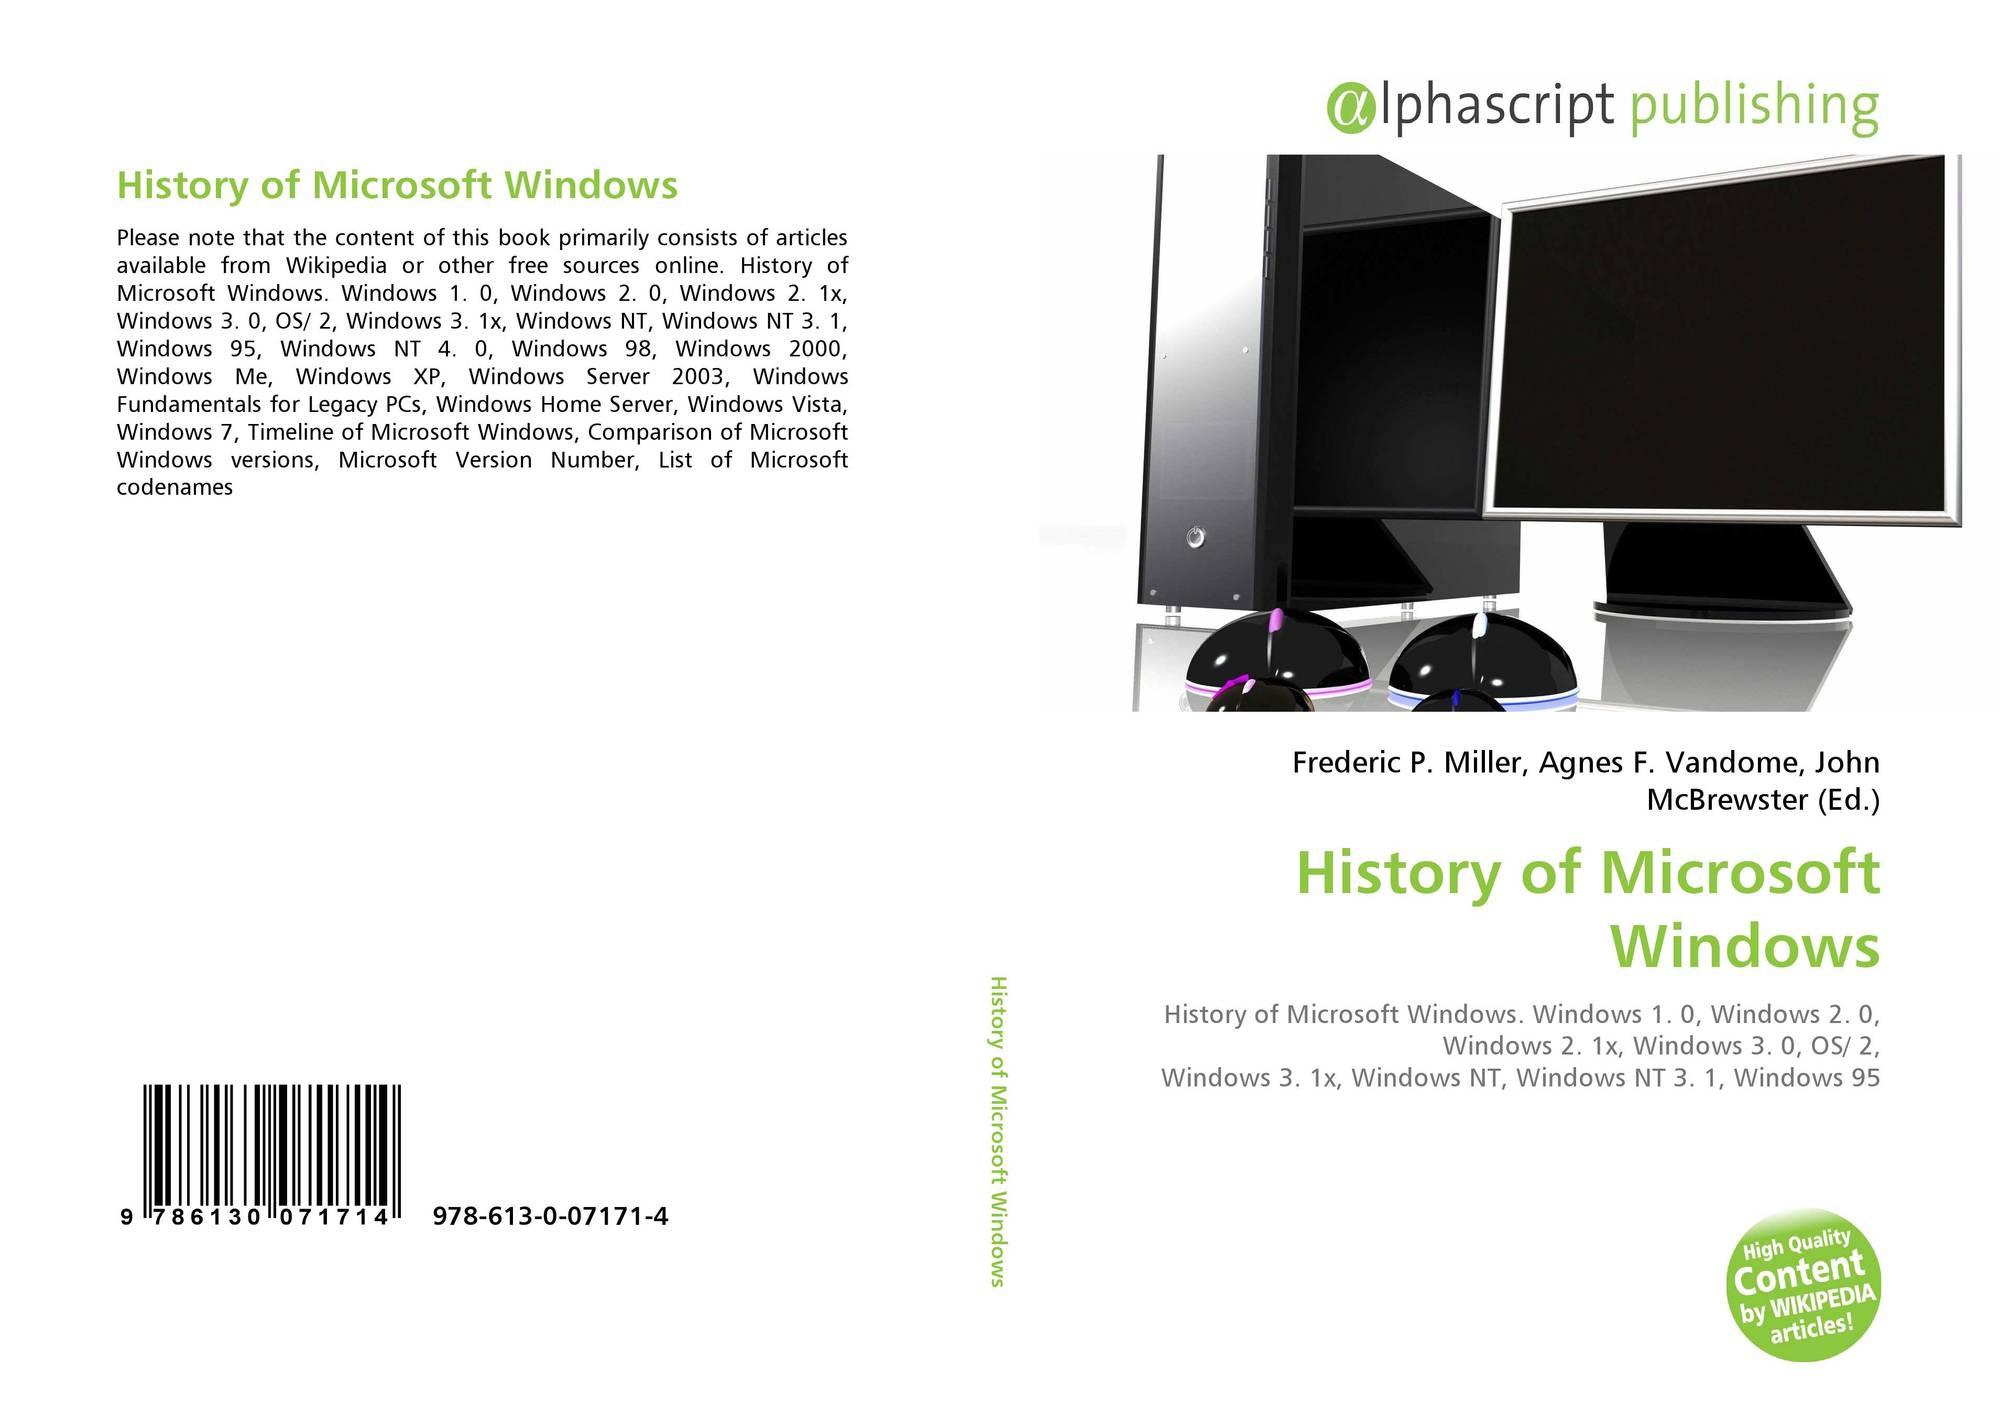 9786130071714 History of Microsoft Windows 978 613 0 07171 4 613007171X